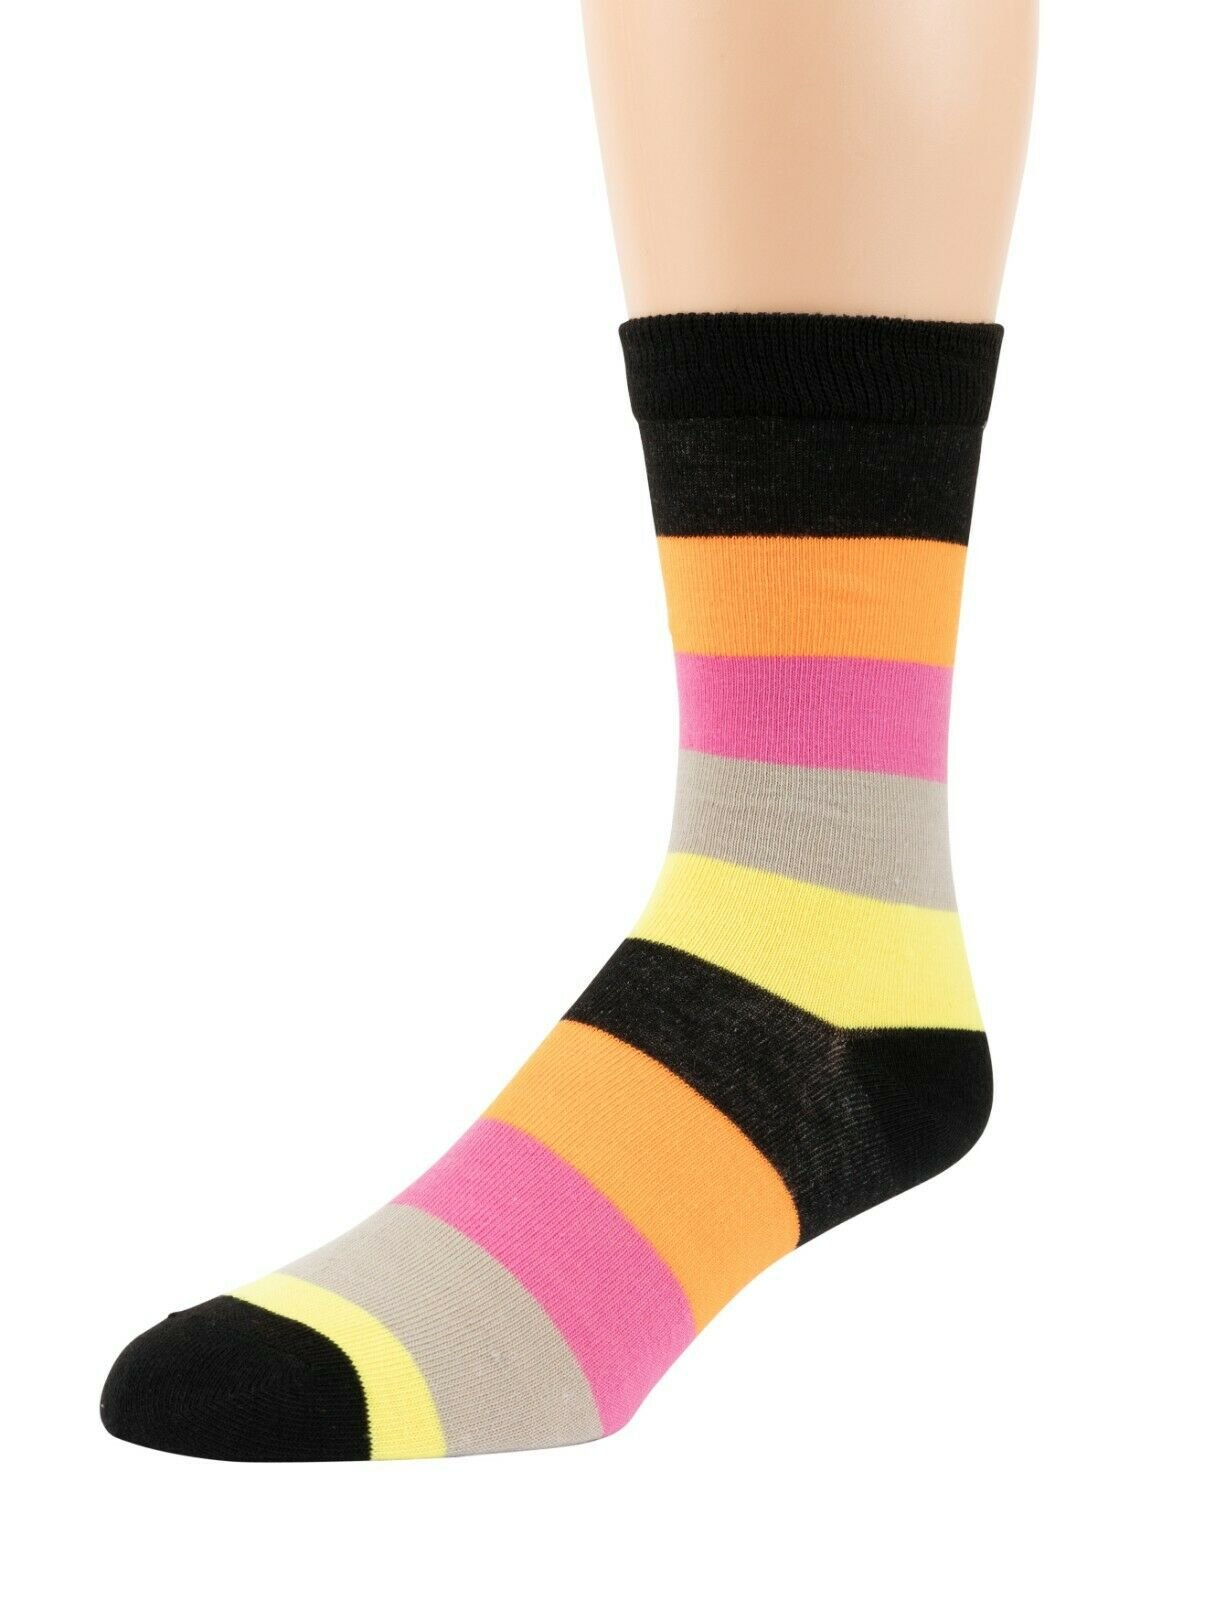 Mitch-Bogen-Mens-Cotton-Dress-Socks-Colorful-Fashion-Crew-Socks-8-Pack-Gift-Box thumbnail 19